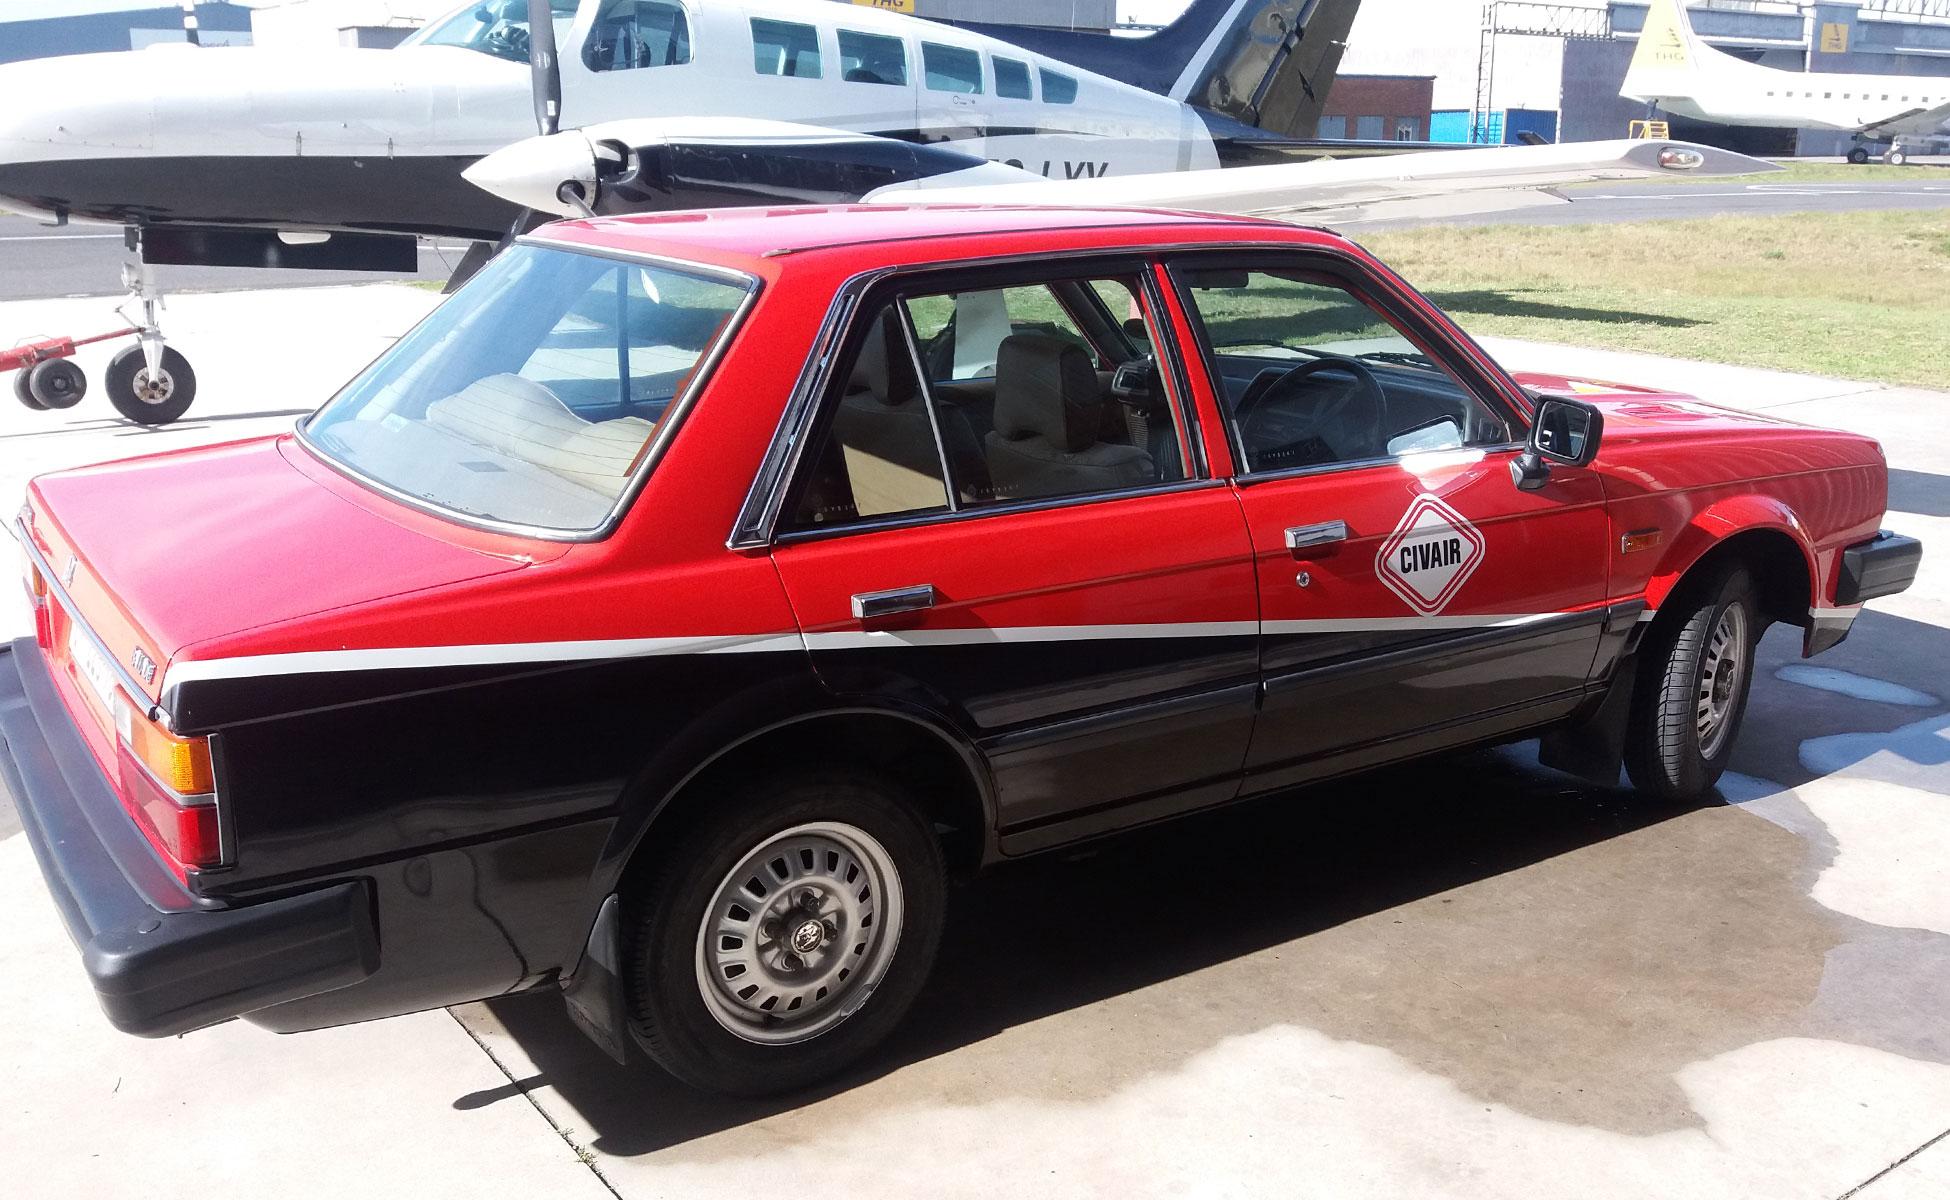 Civair classic car hire